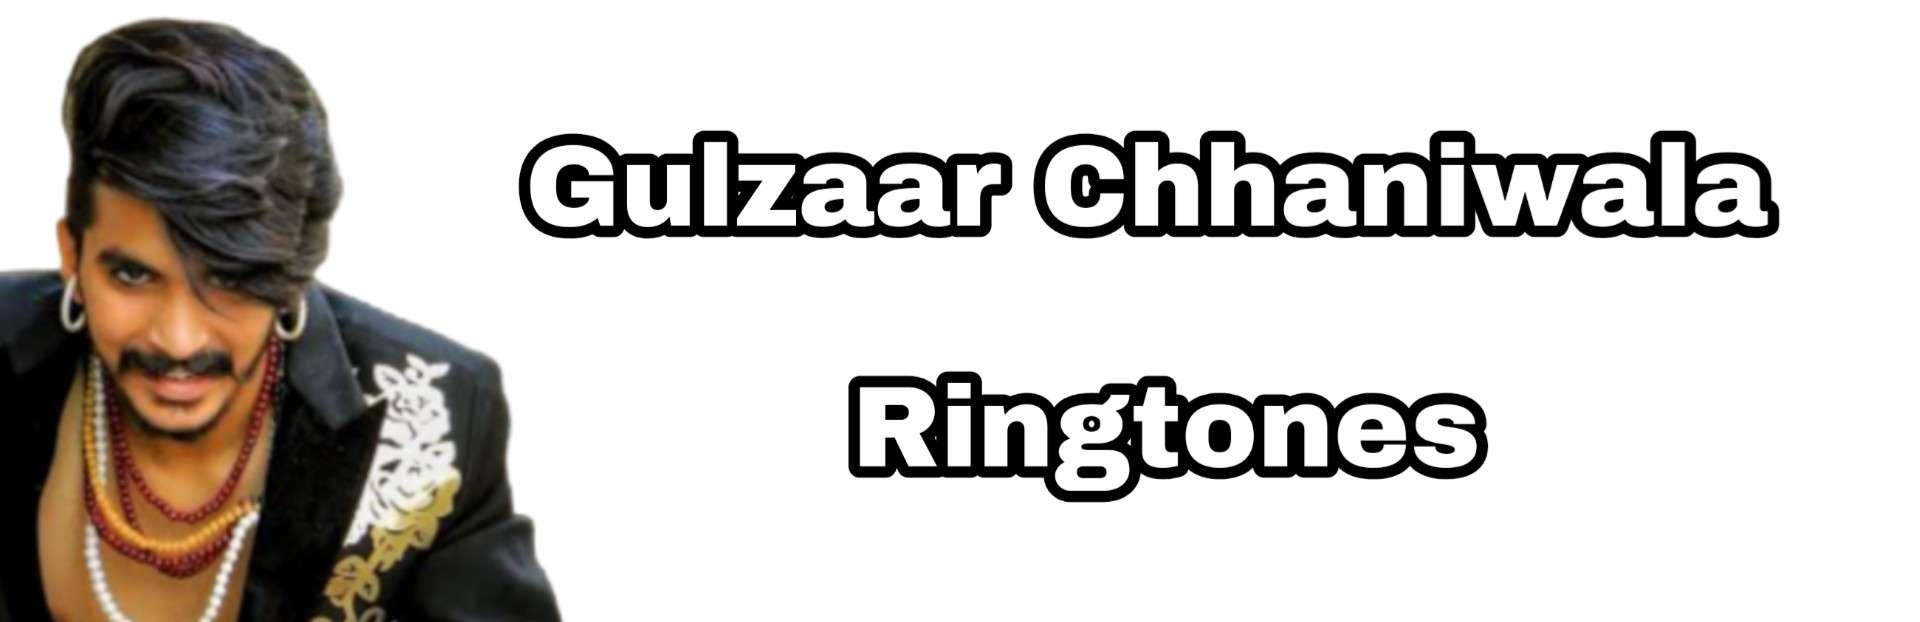 Bhagat Gulzaar Chhaniwala Mp3 Ringtone Download